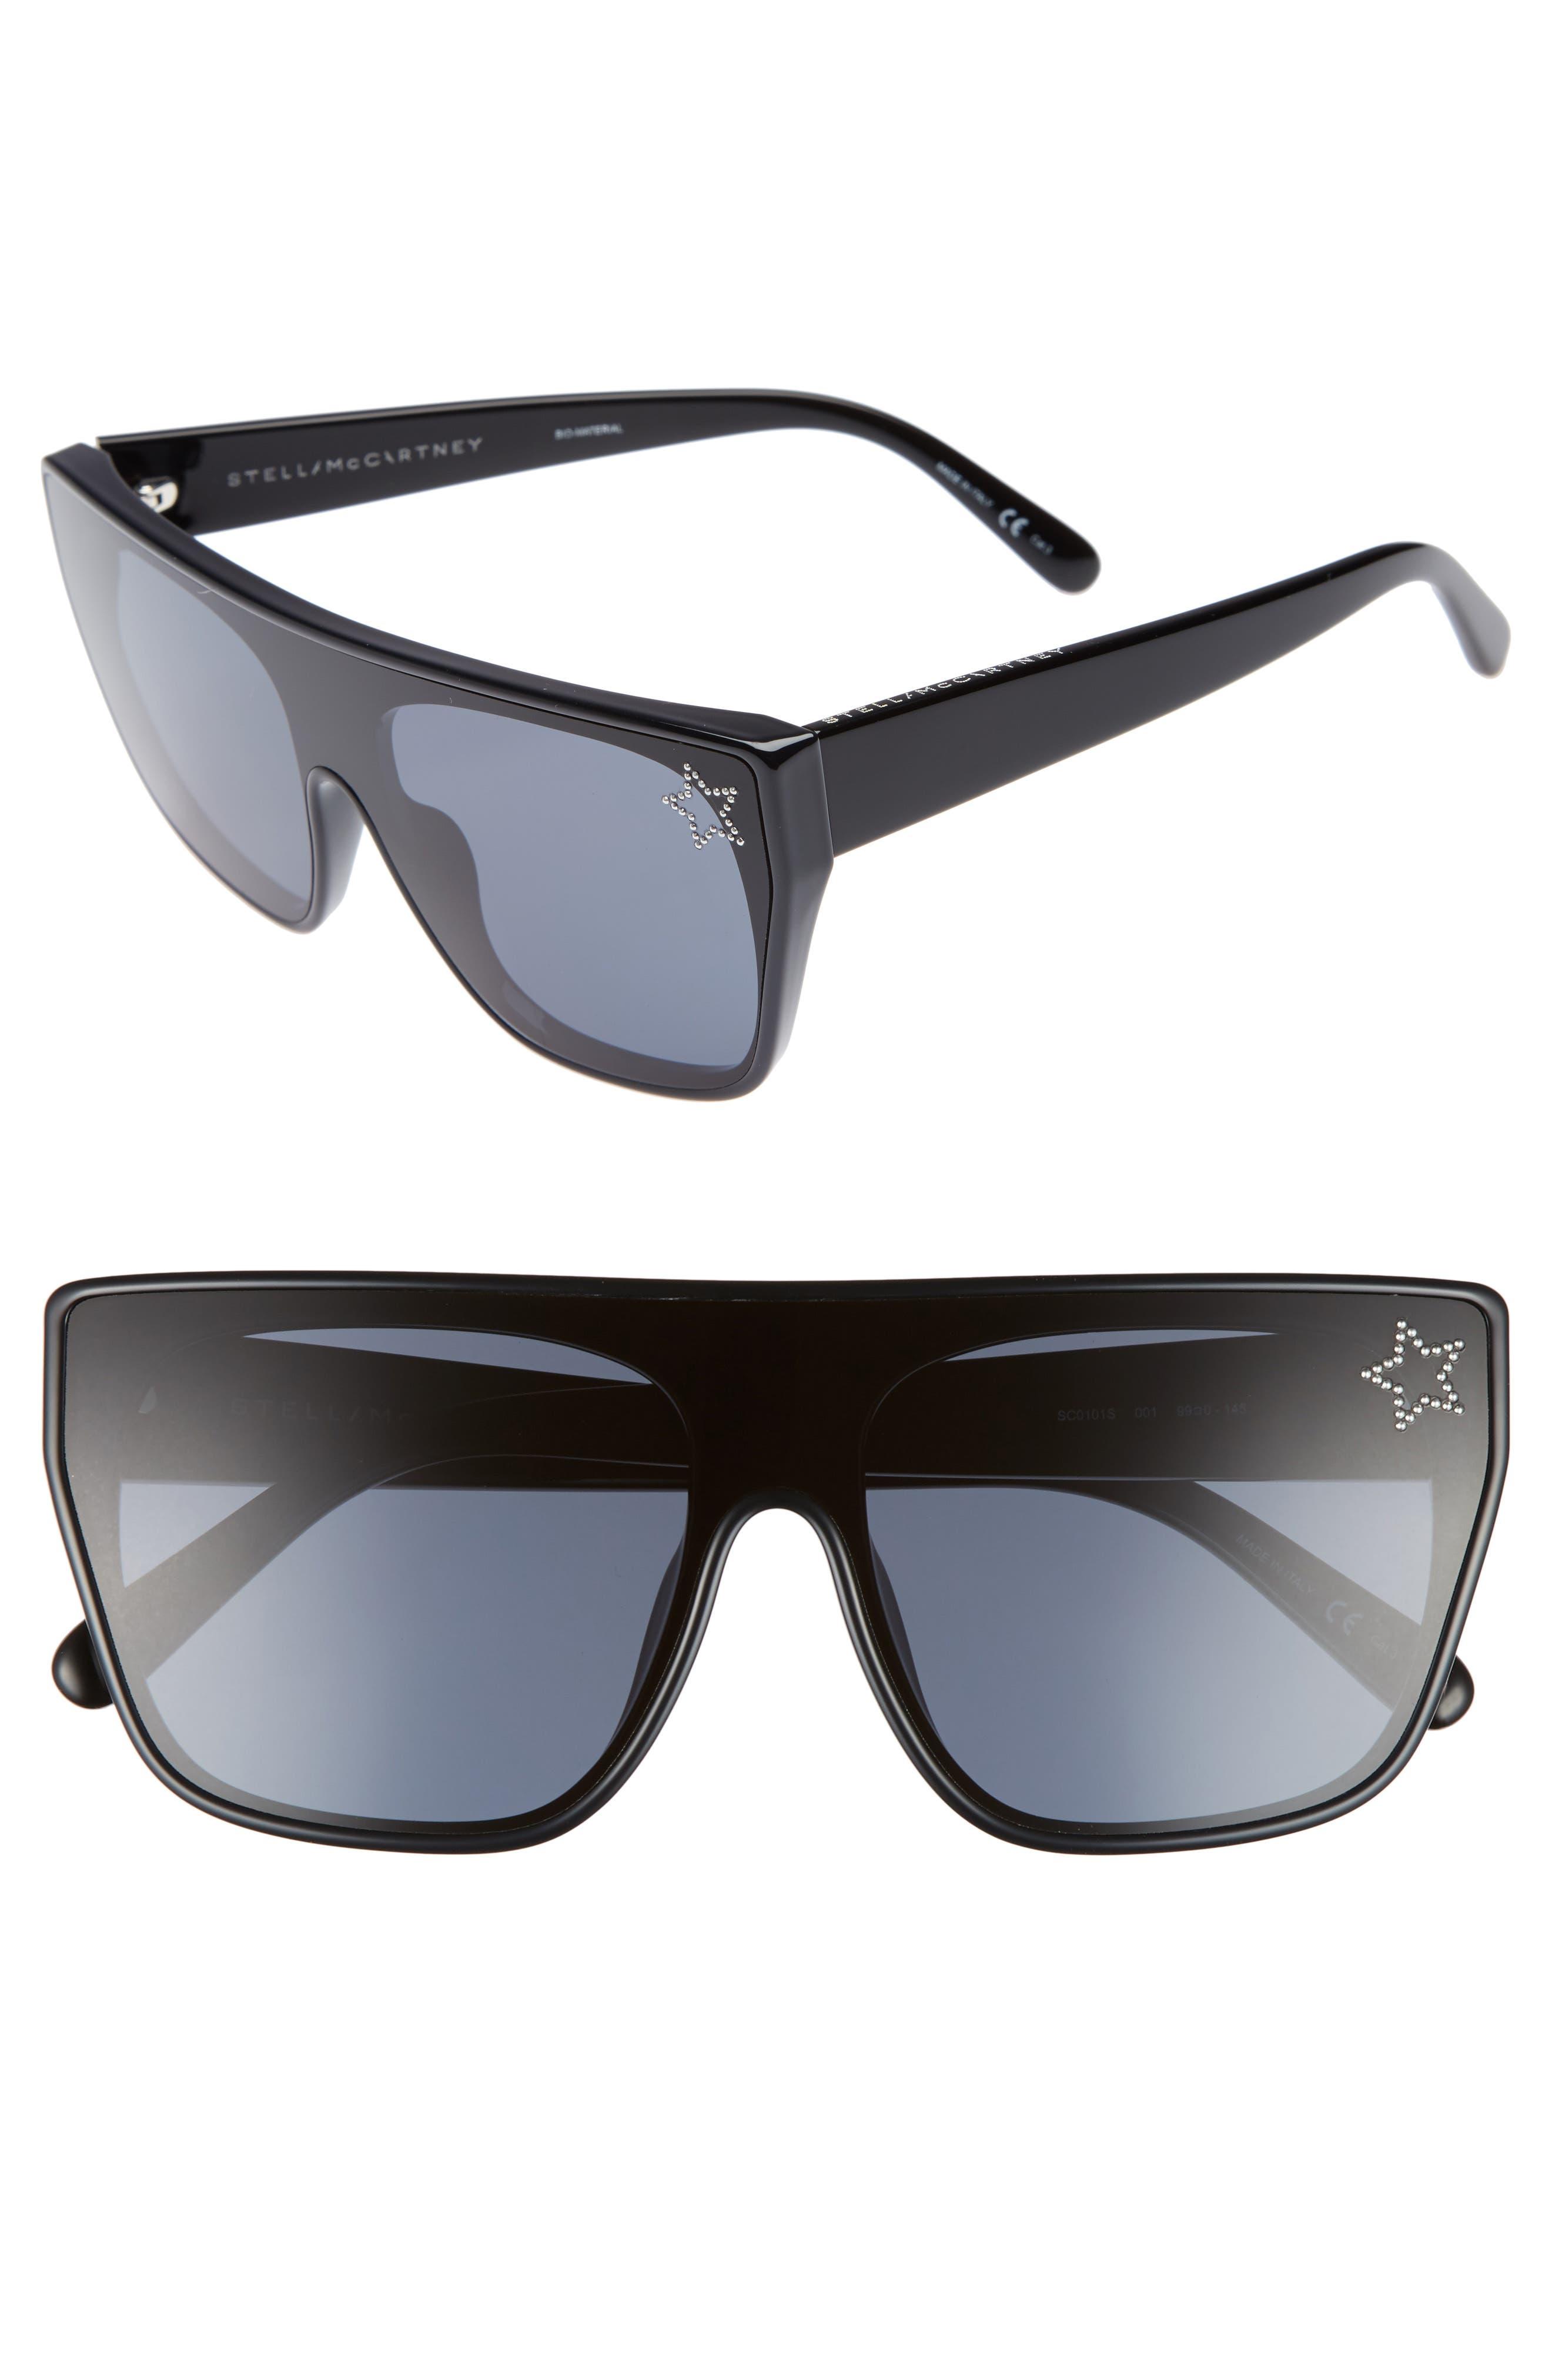 99mm Flat Top Sunglasses,                             Main thumbnail 1, color,                             BLACK